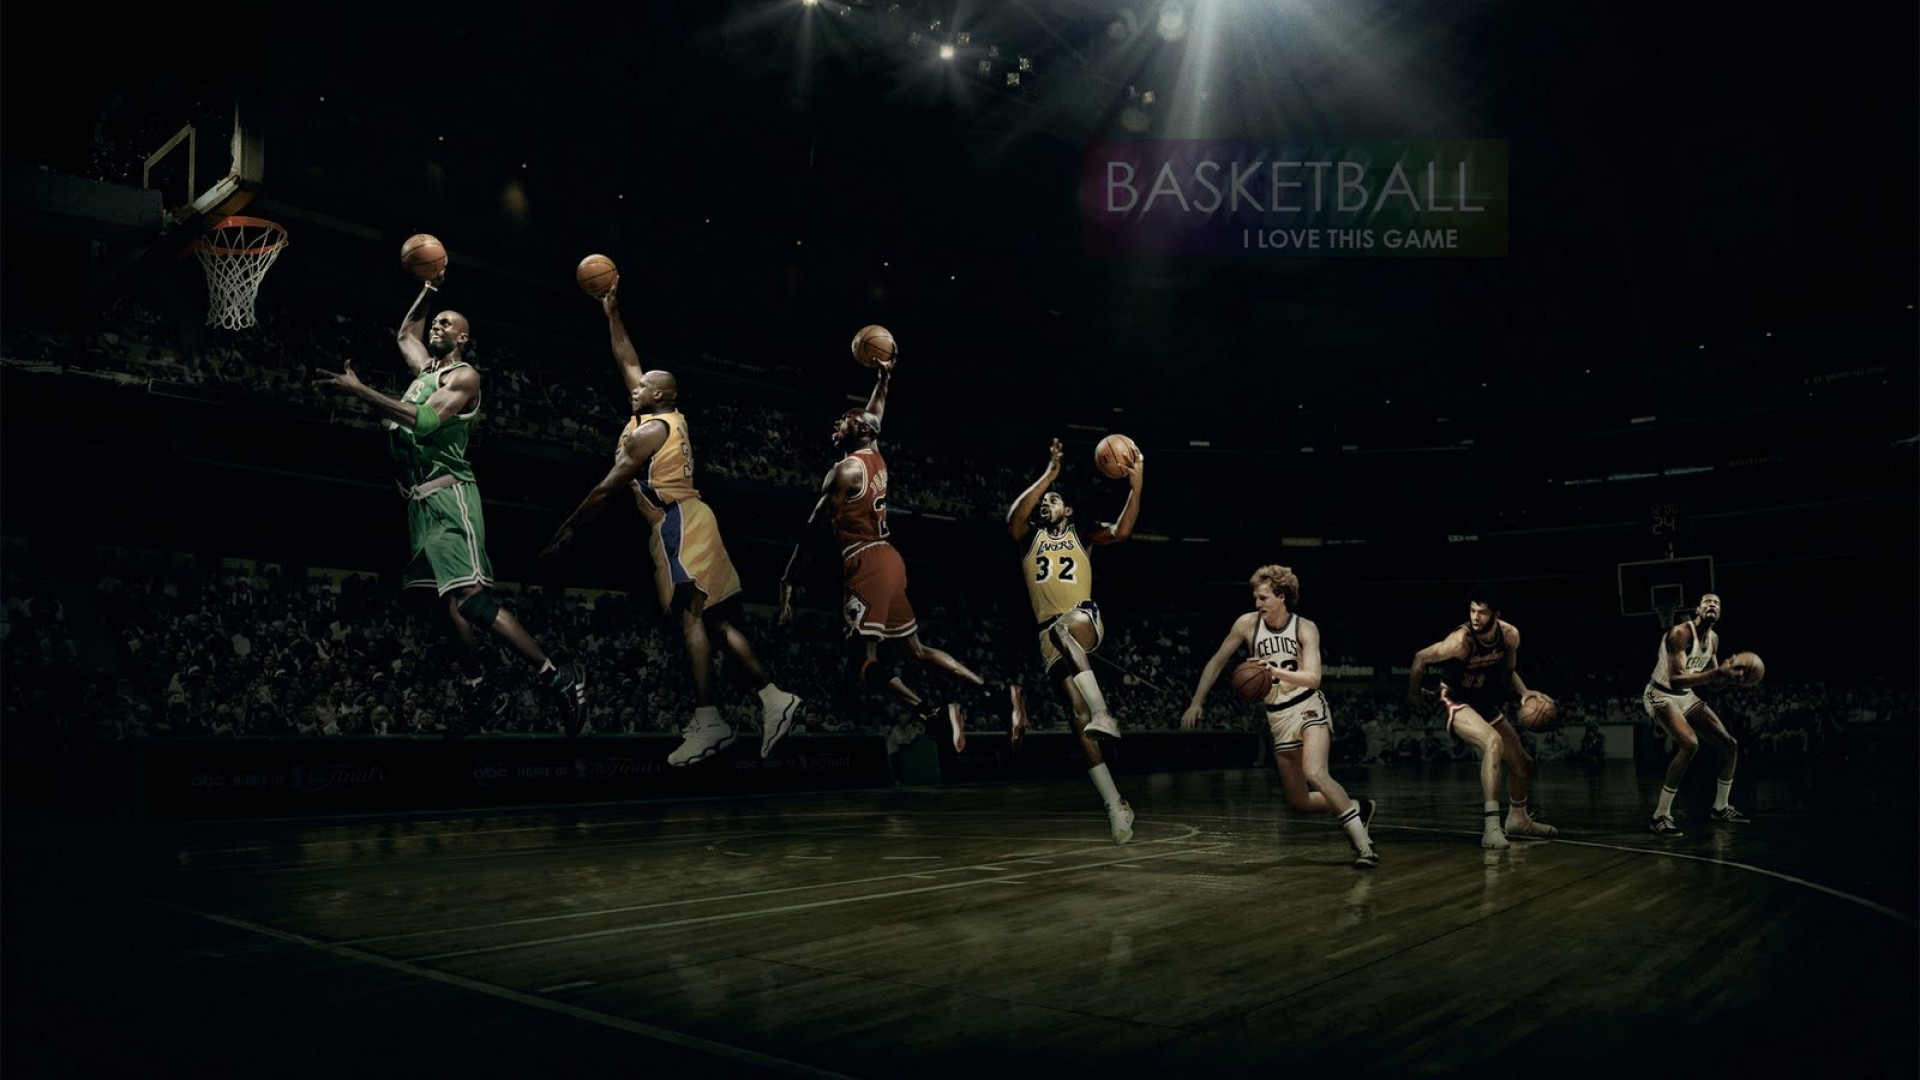 … basketball hd wallpapers on wallpaperget com …